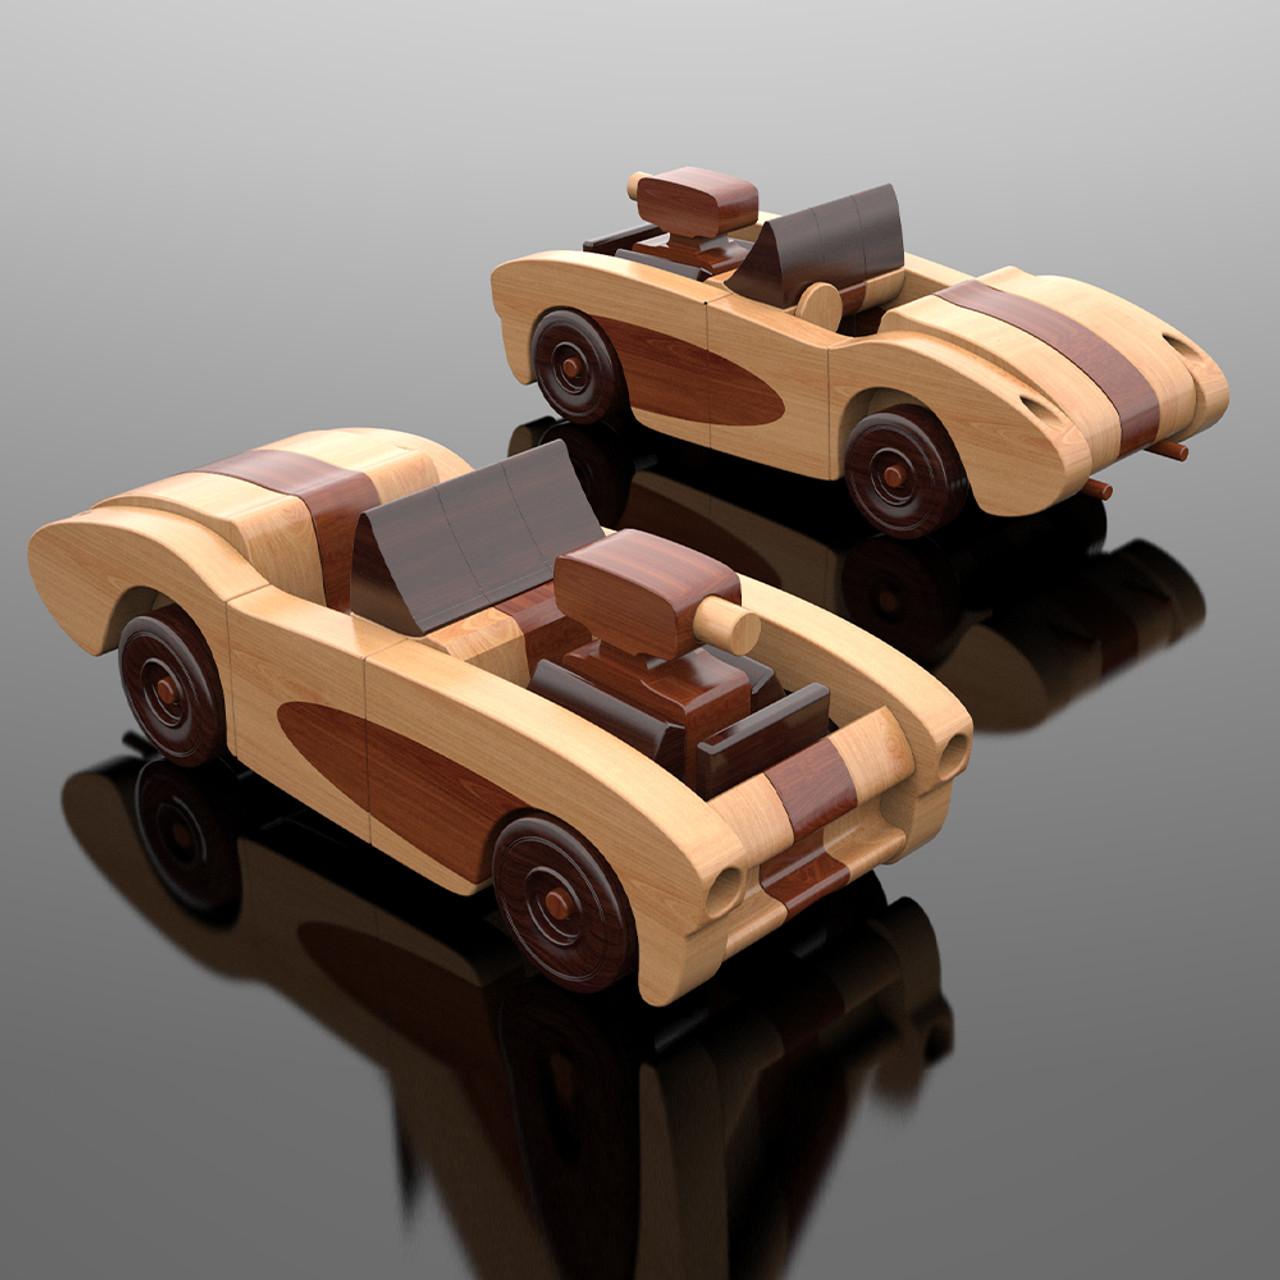 Scroll Saw Magic 1957 Corvette Hot Rod Wood Toy Plans